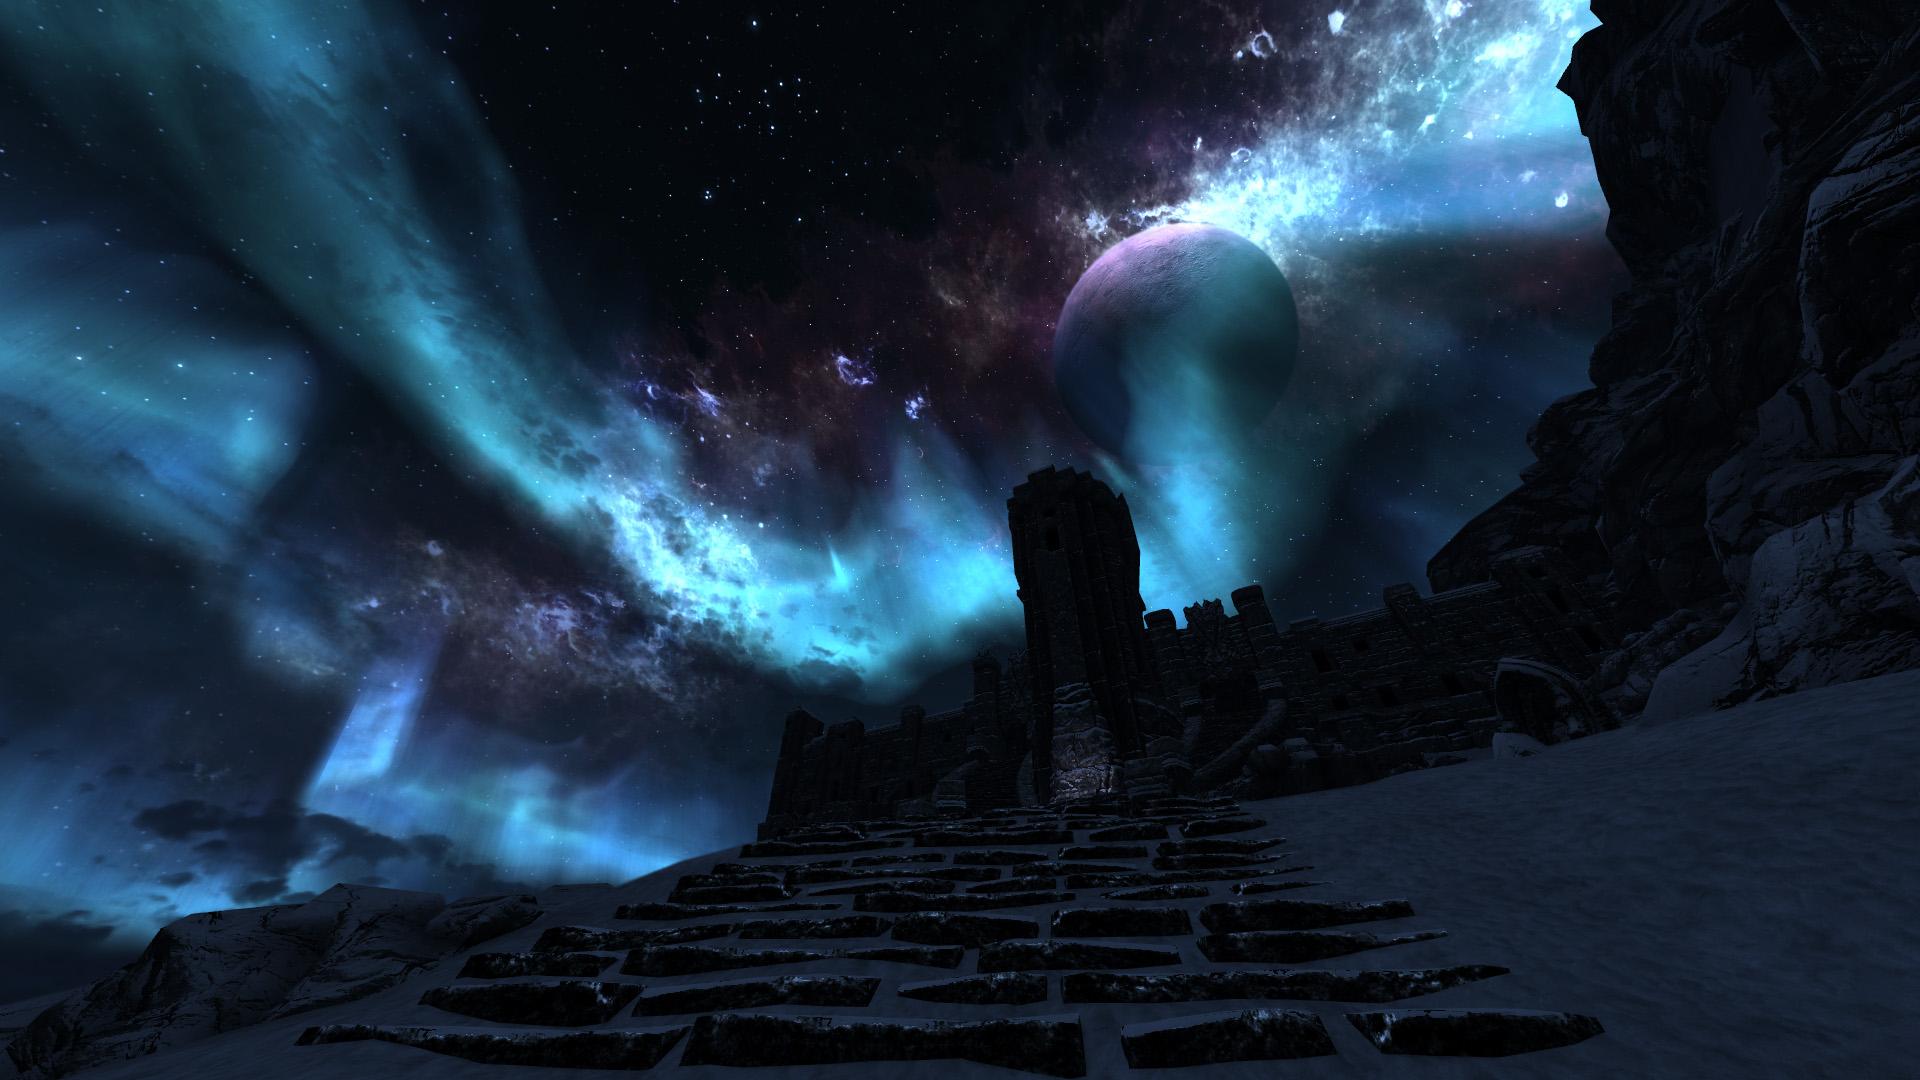 Alien Planet Windows 7 3d Wallpaper The Elder Scrolls V Skyrim Fond D 233 Cran Hd Arri 232 Re Plan